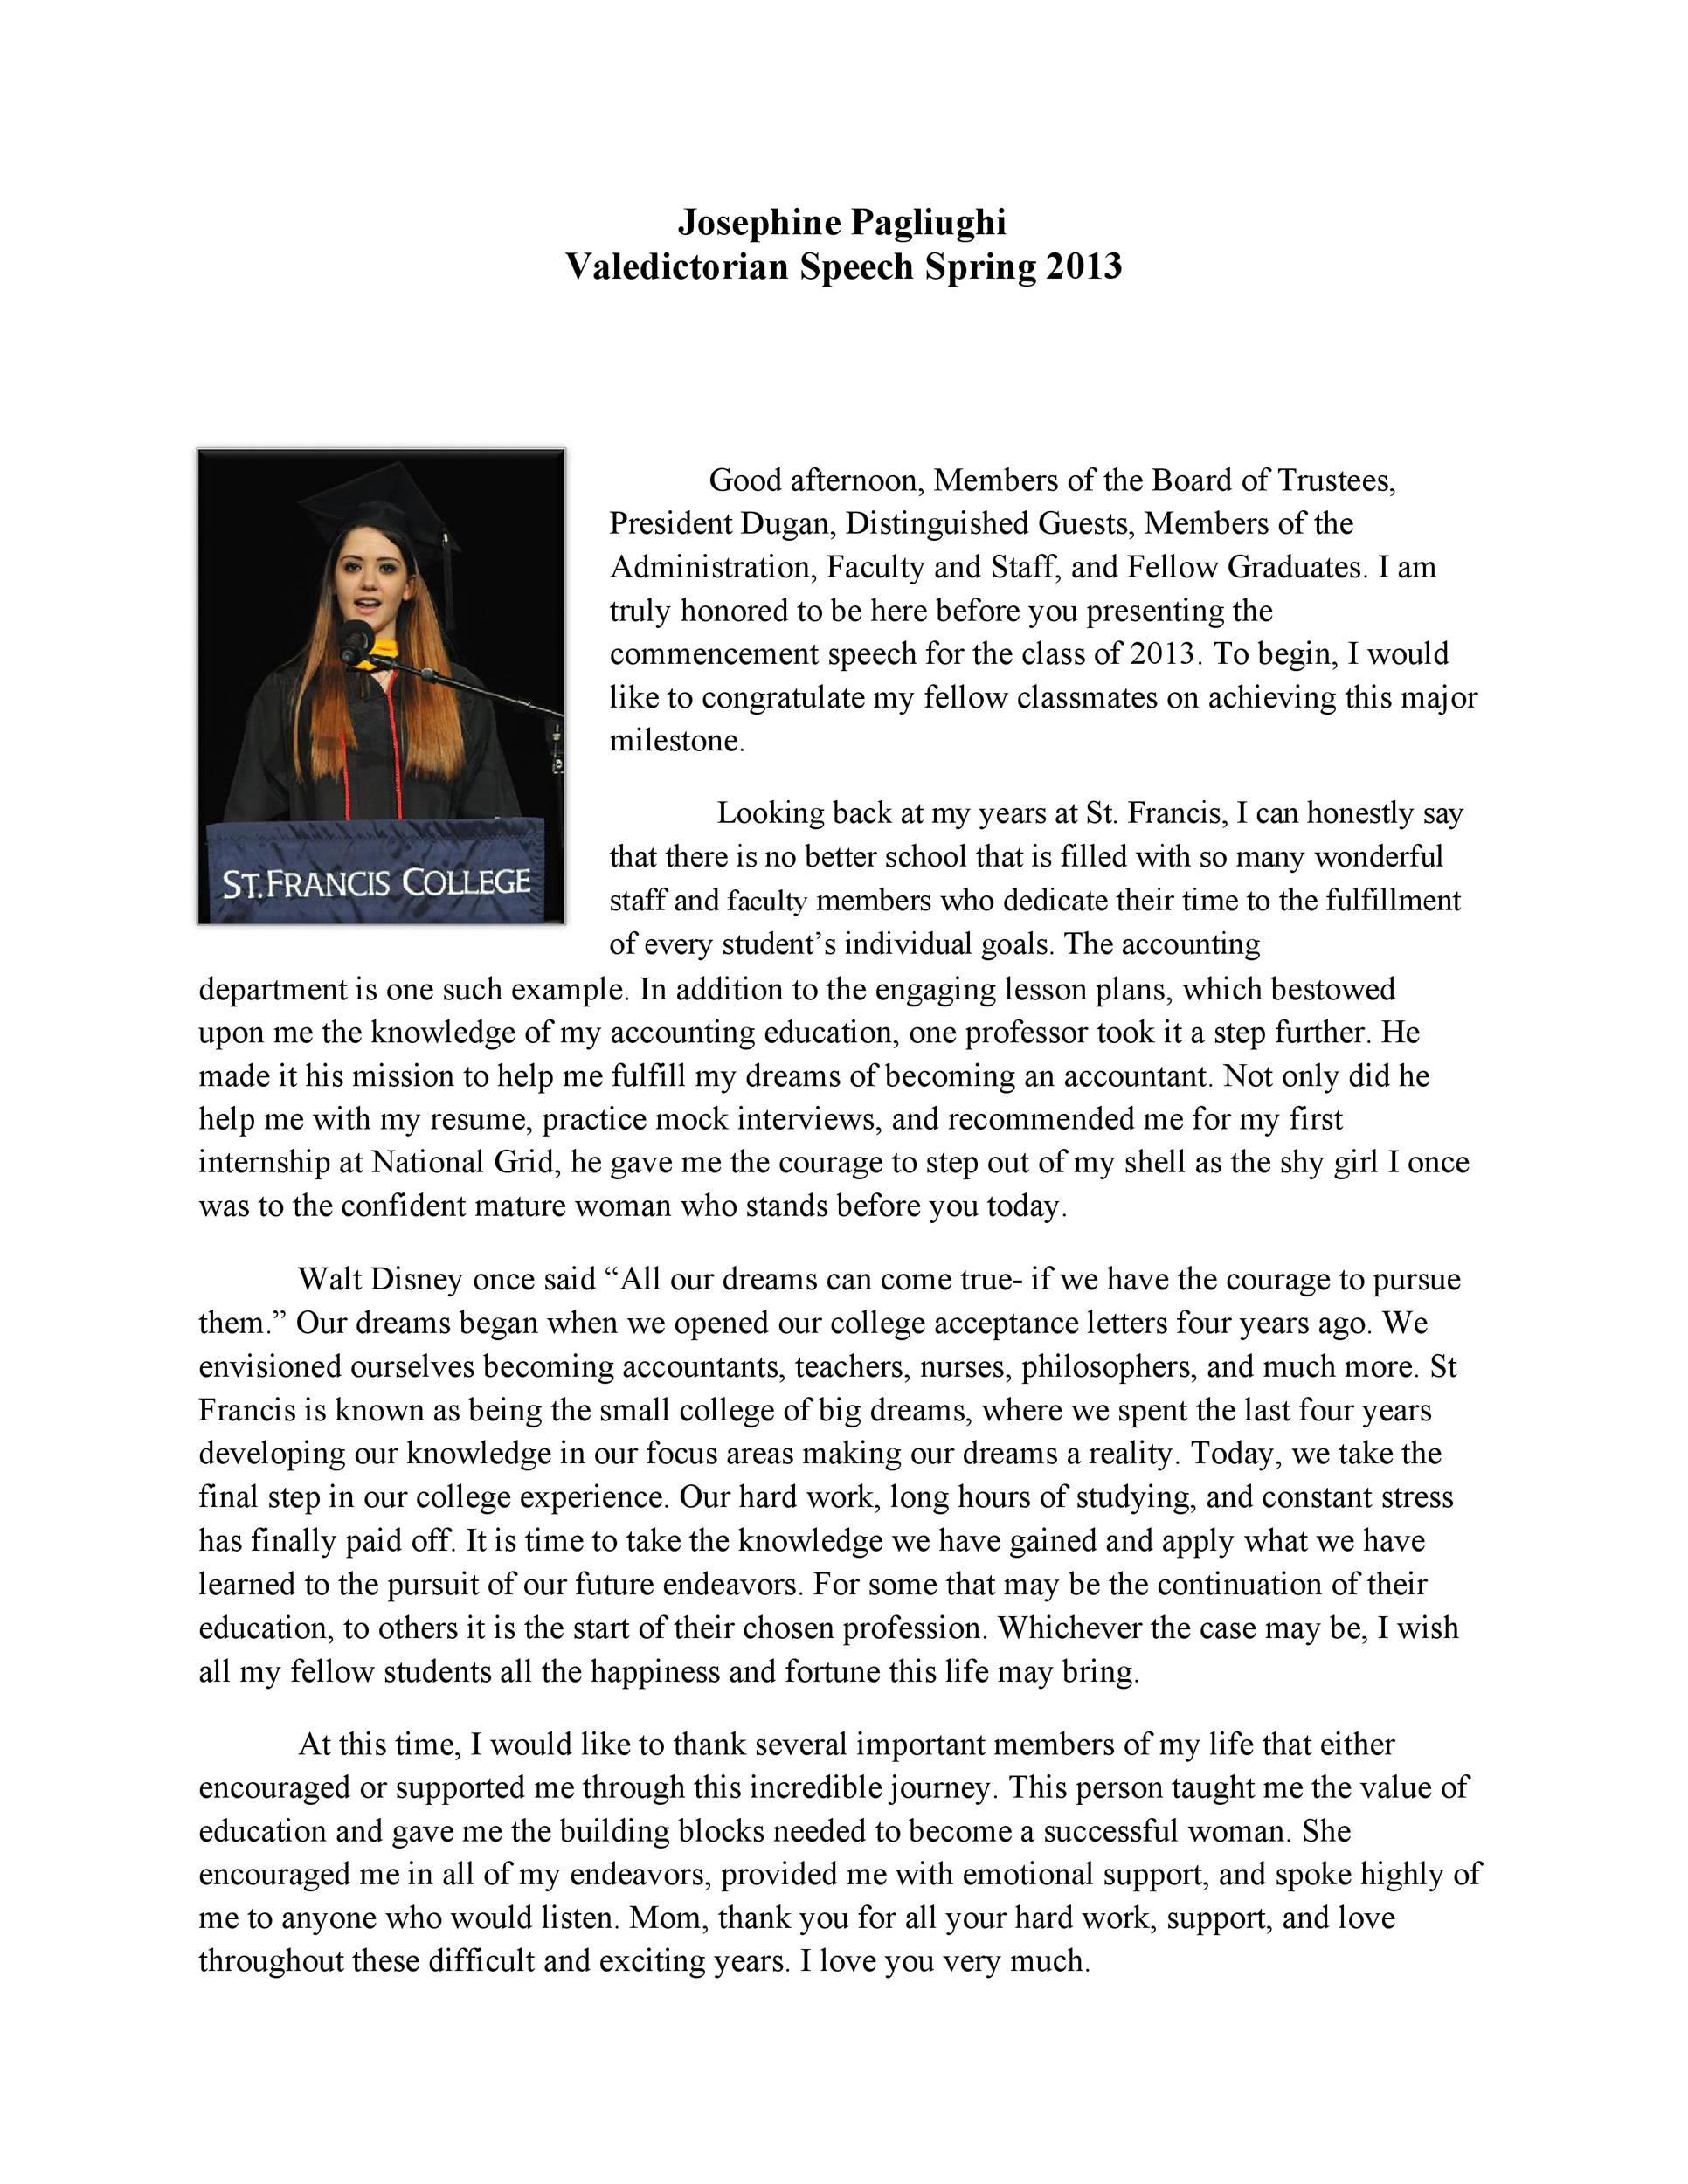 Free graduation speech example 19